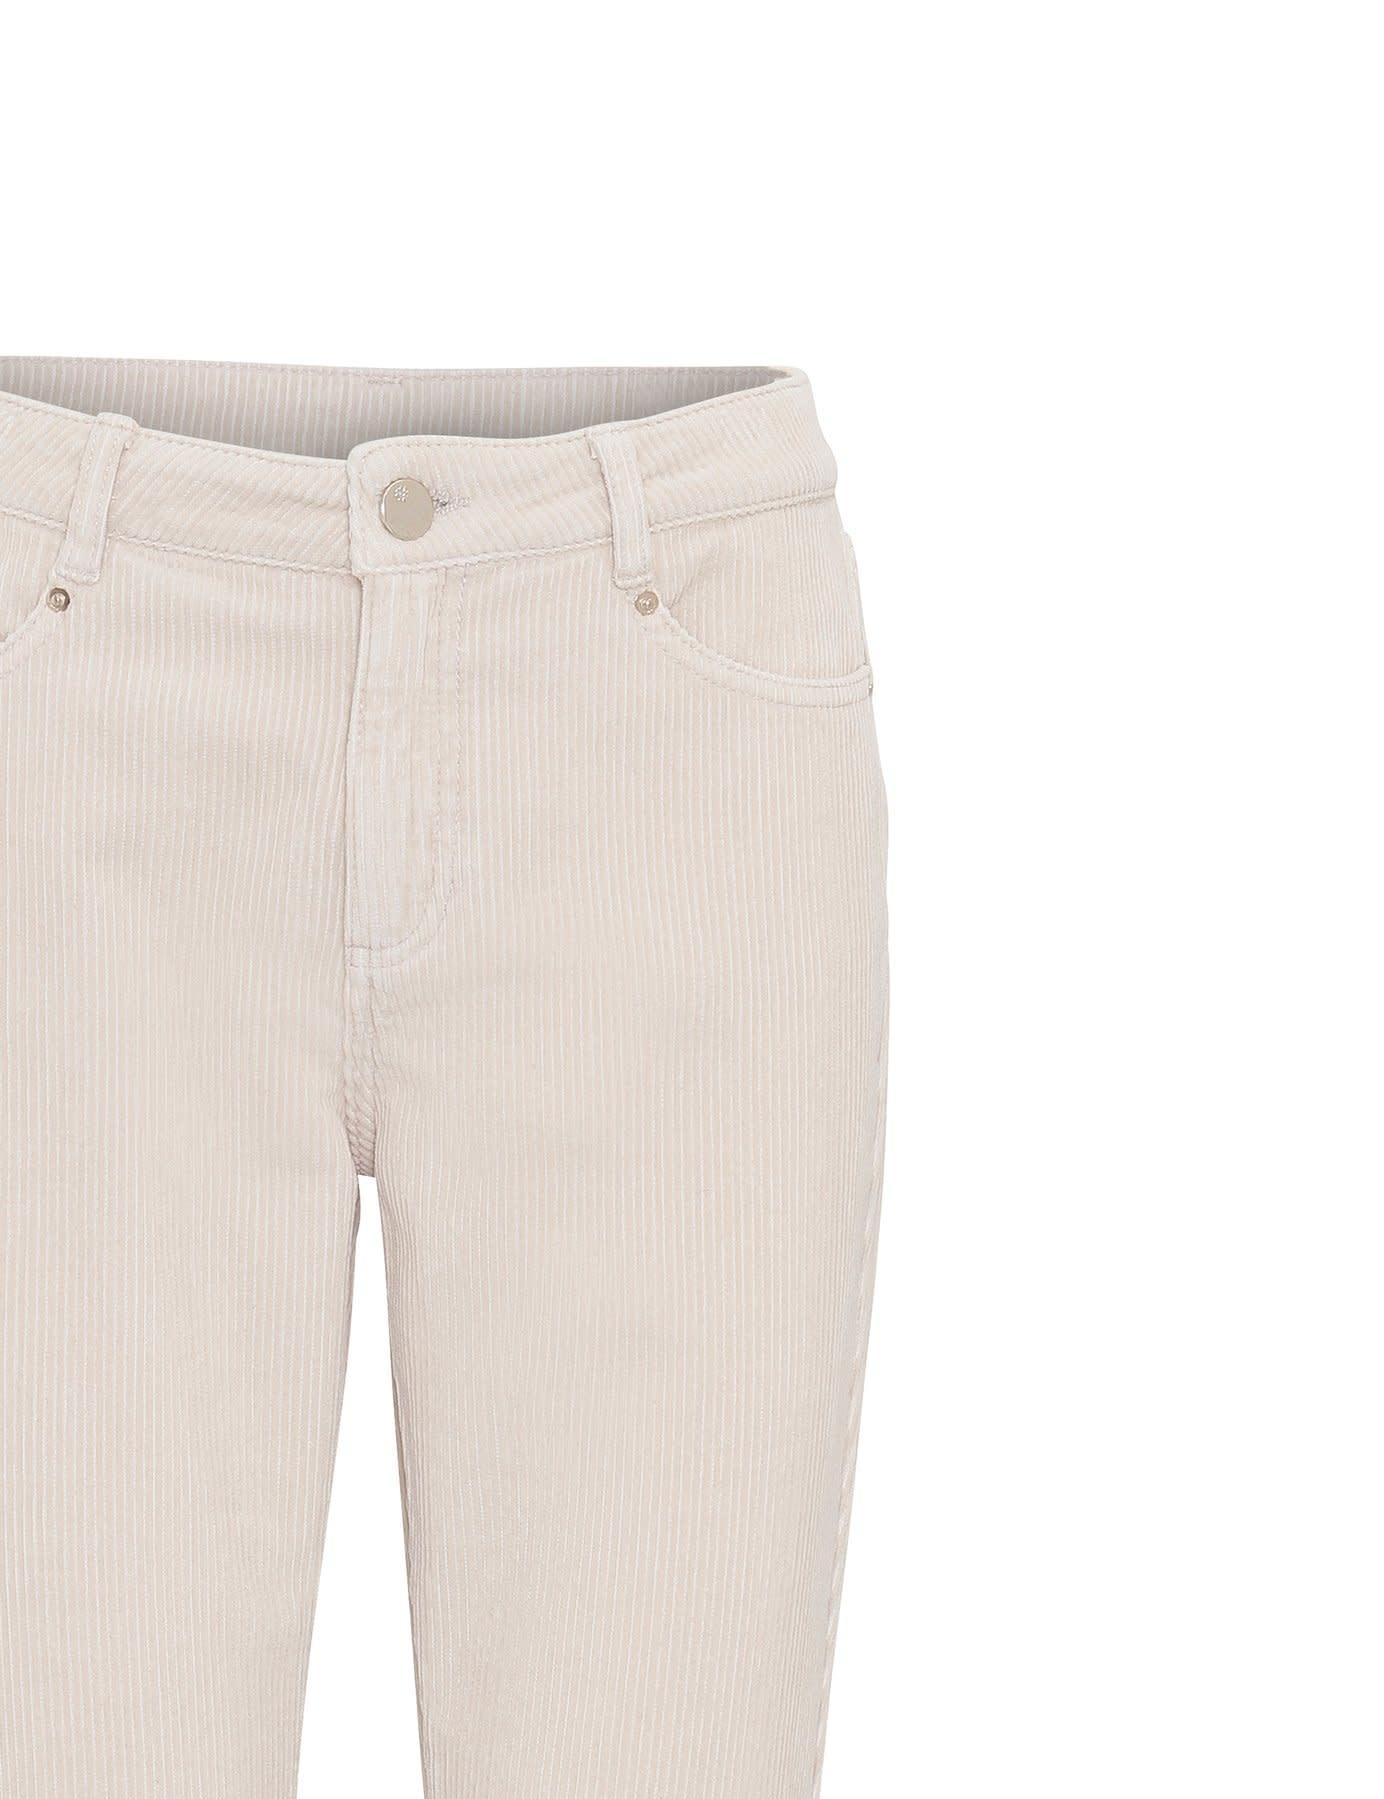 Cadife pants Day-2